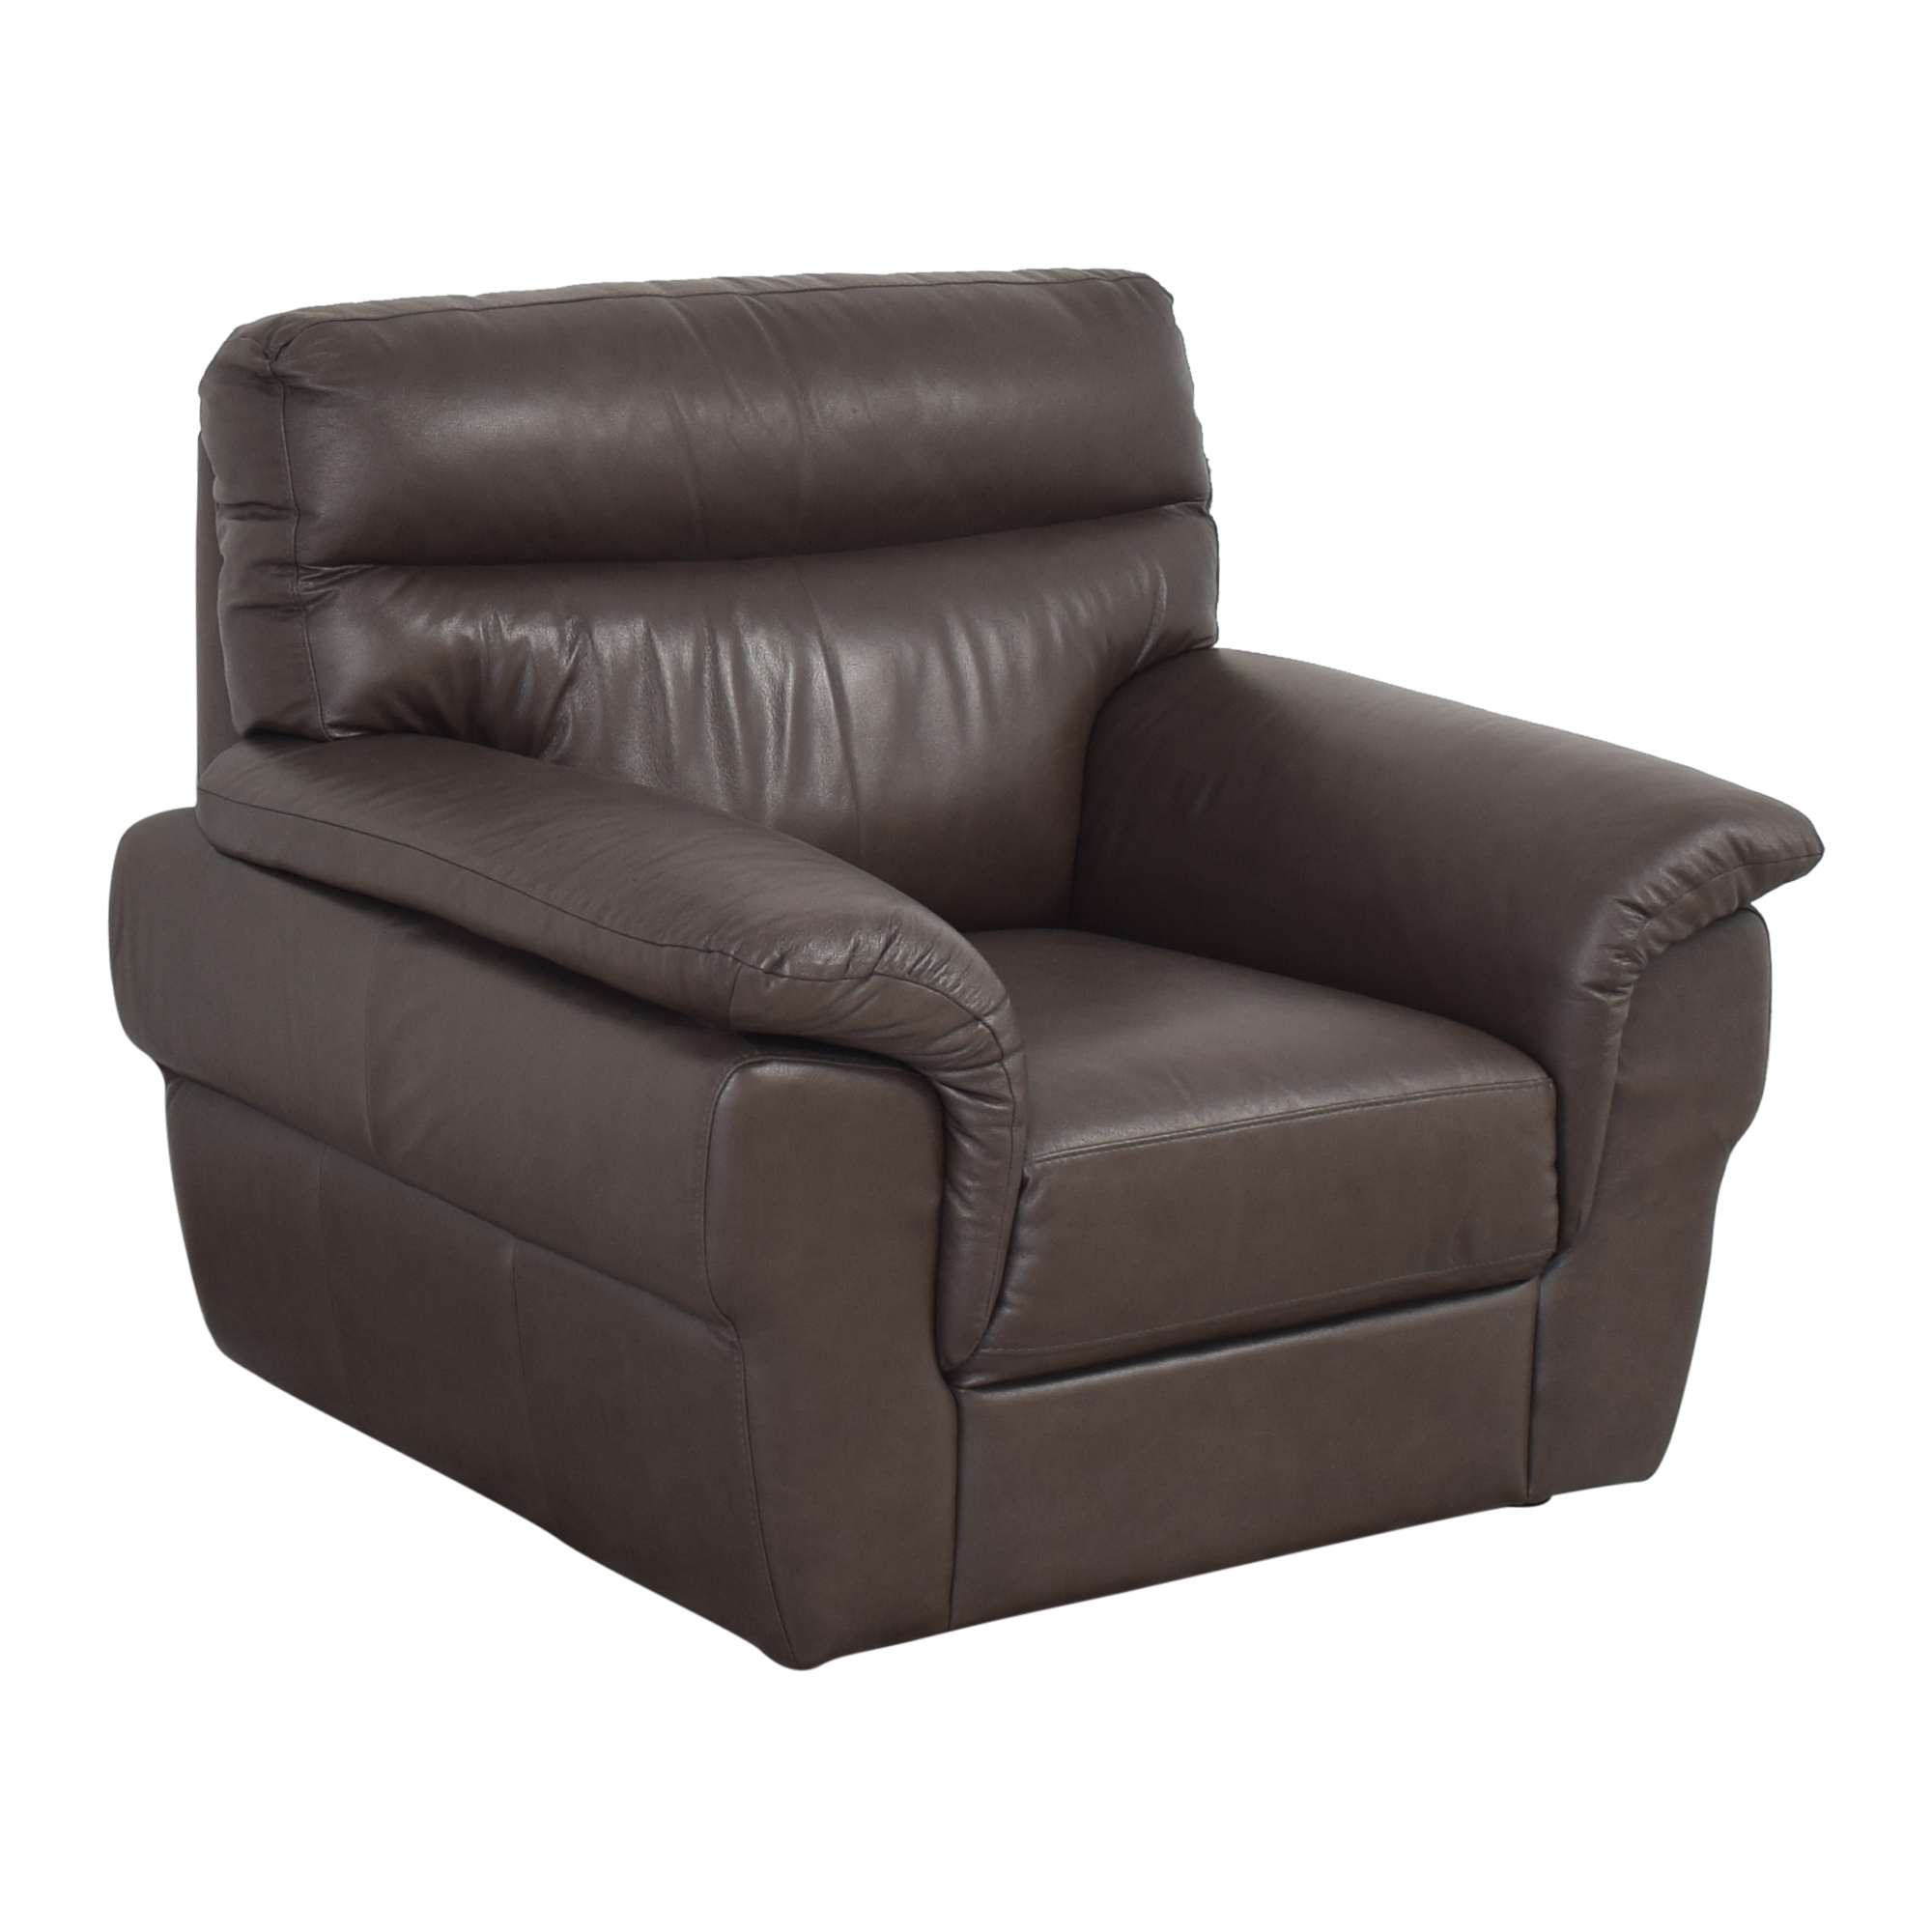 buy Raymour & Flanigan Raymour & Flanigan Luca Chair online